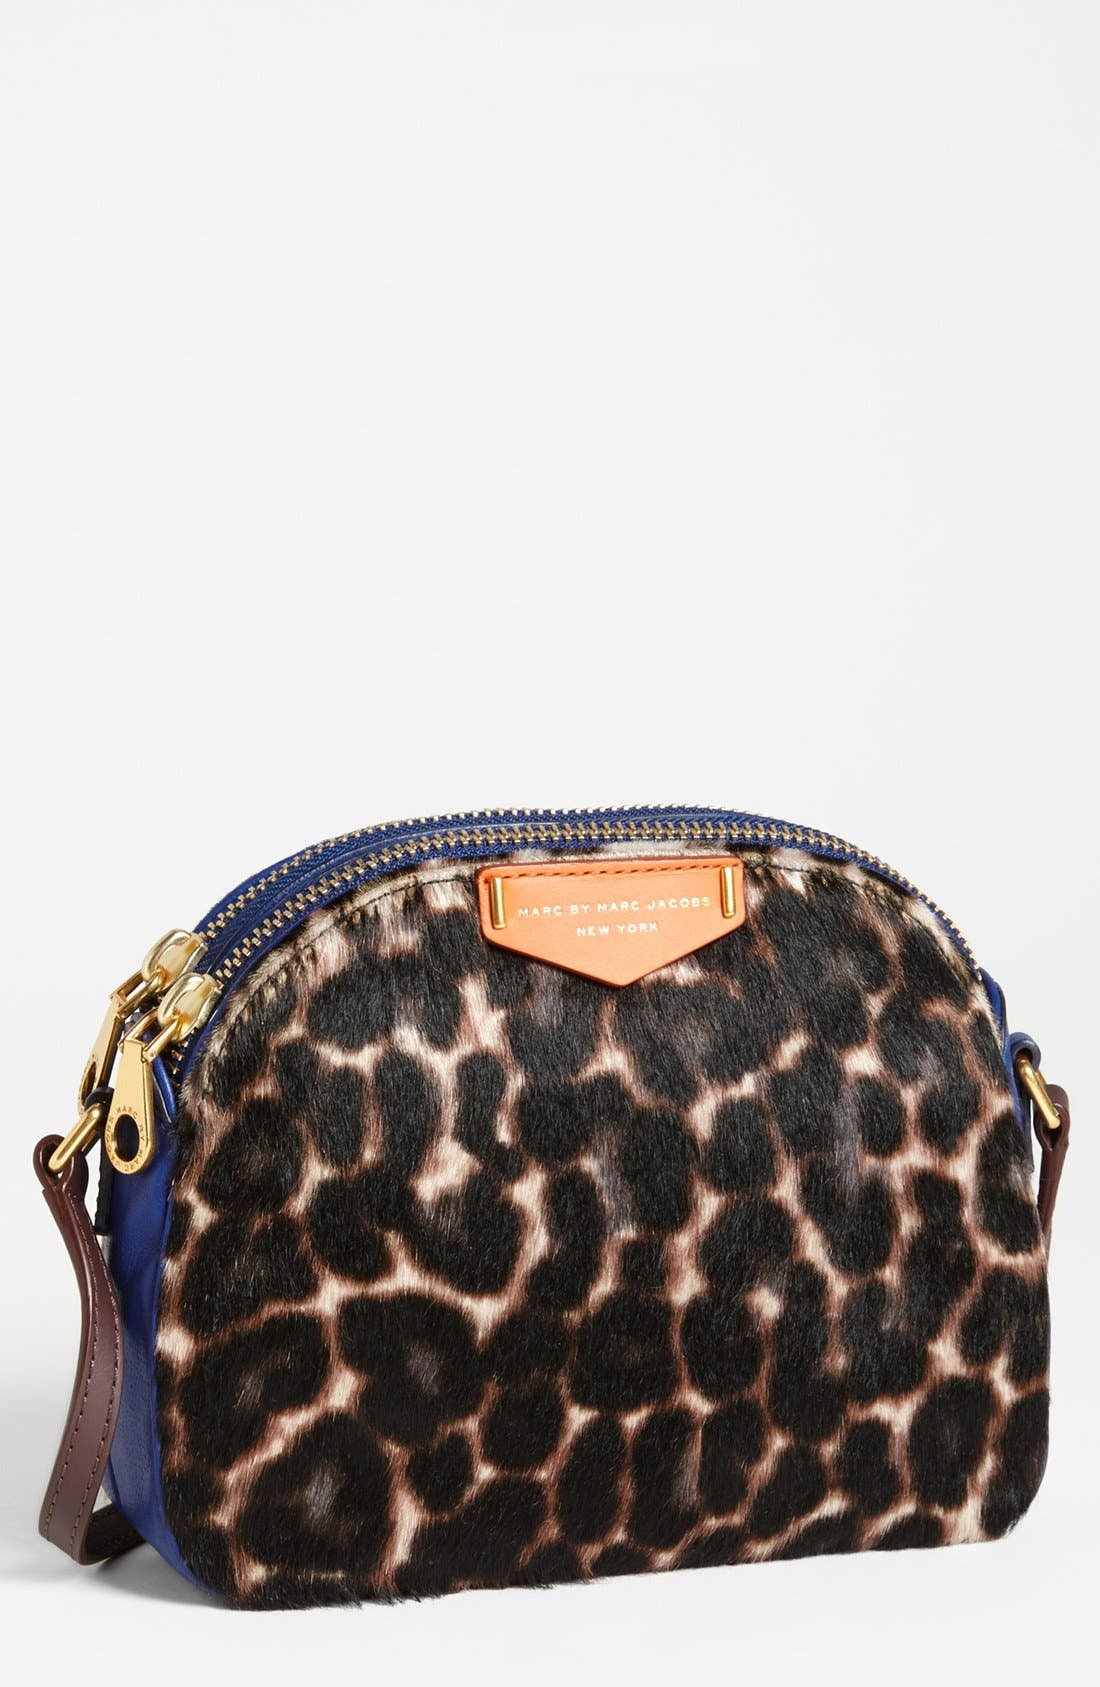 Alternate Image 1 Selected - MARC BY MARC JACOBS 'Lola' Calf Hair Crossbody Bag